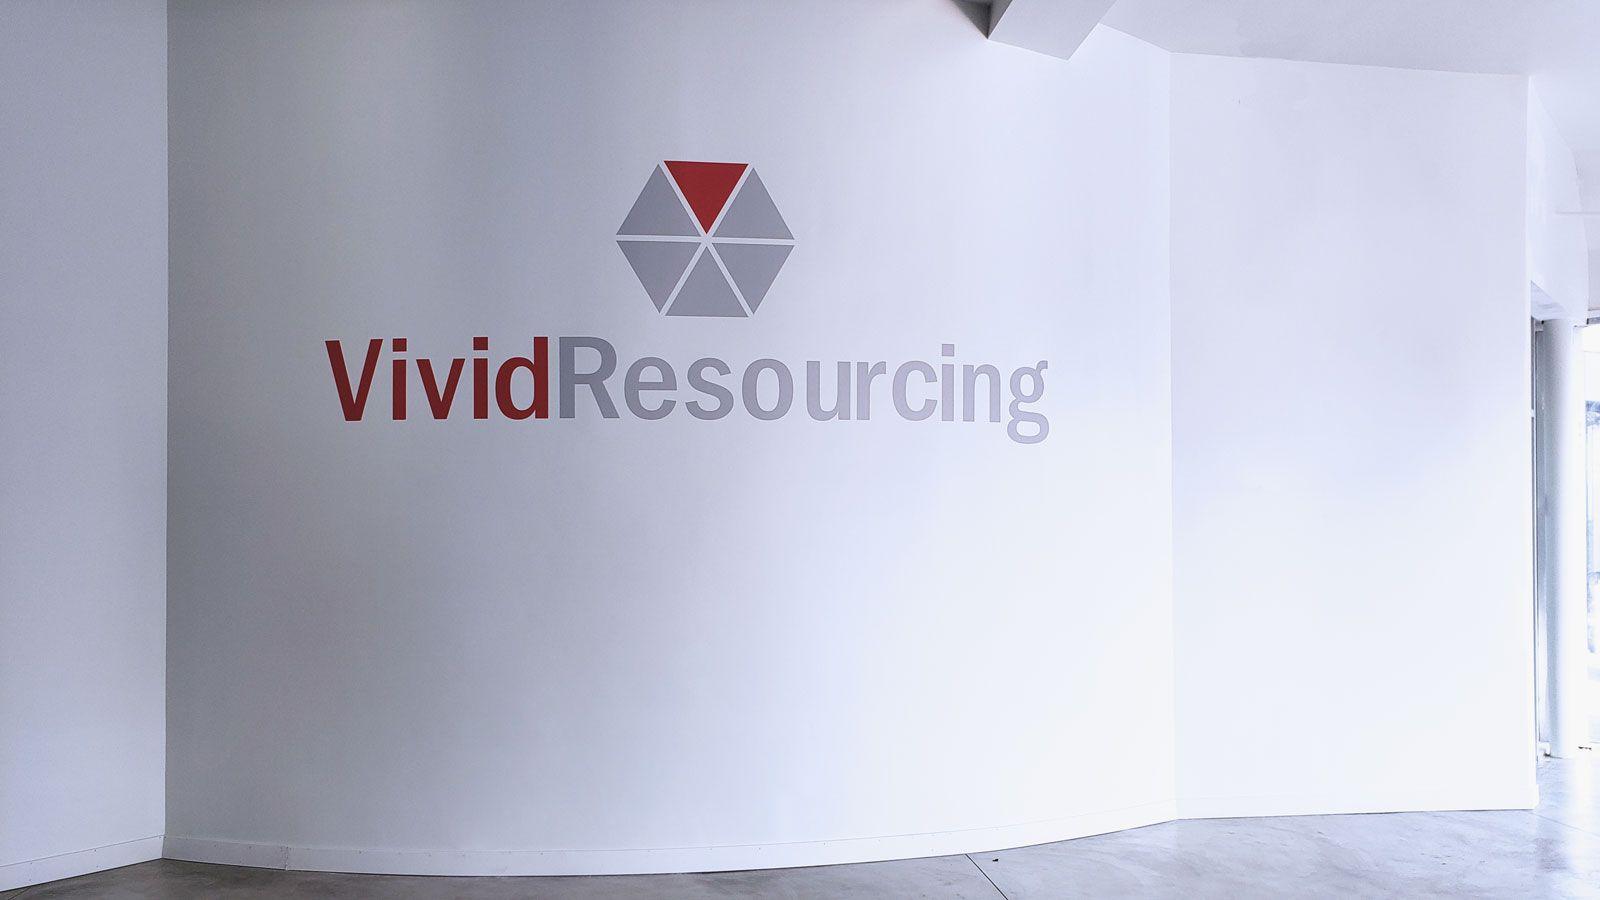 Vivid Resourcing wall decal